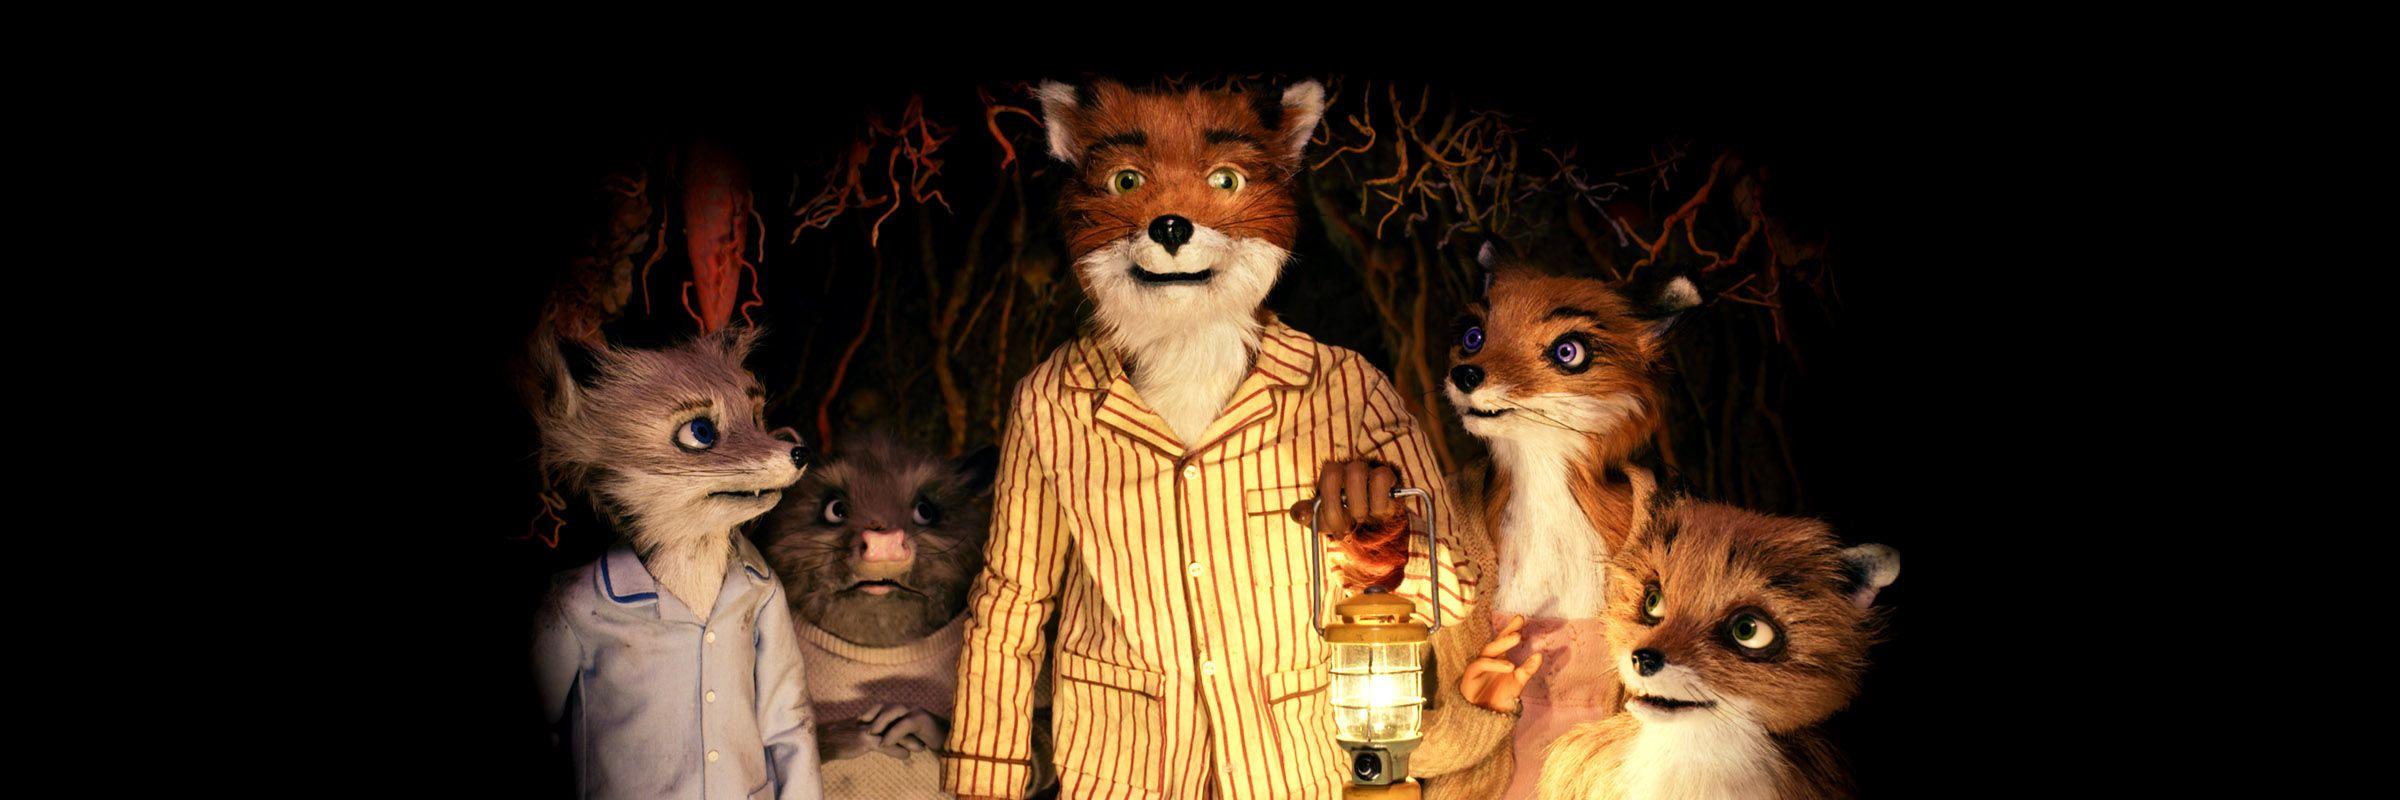 fantastic mr fox full movie in hindi free download